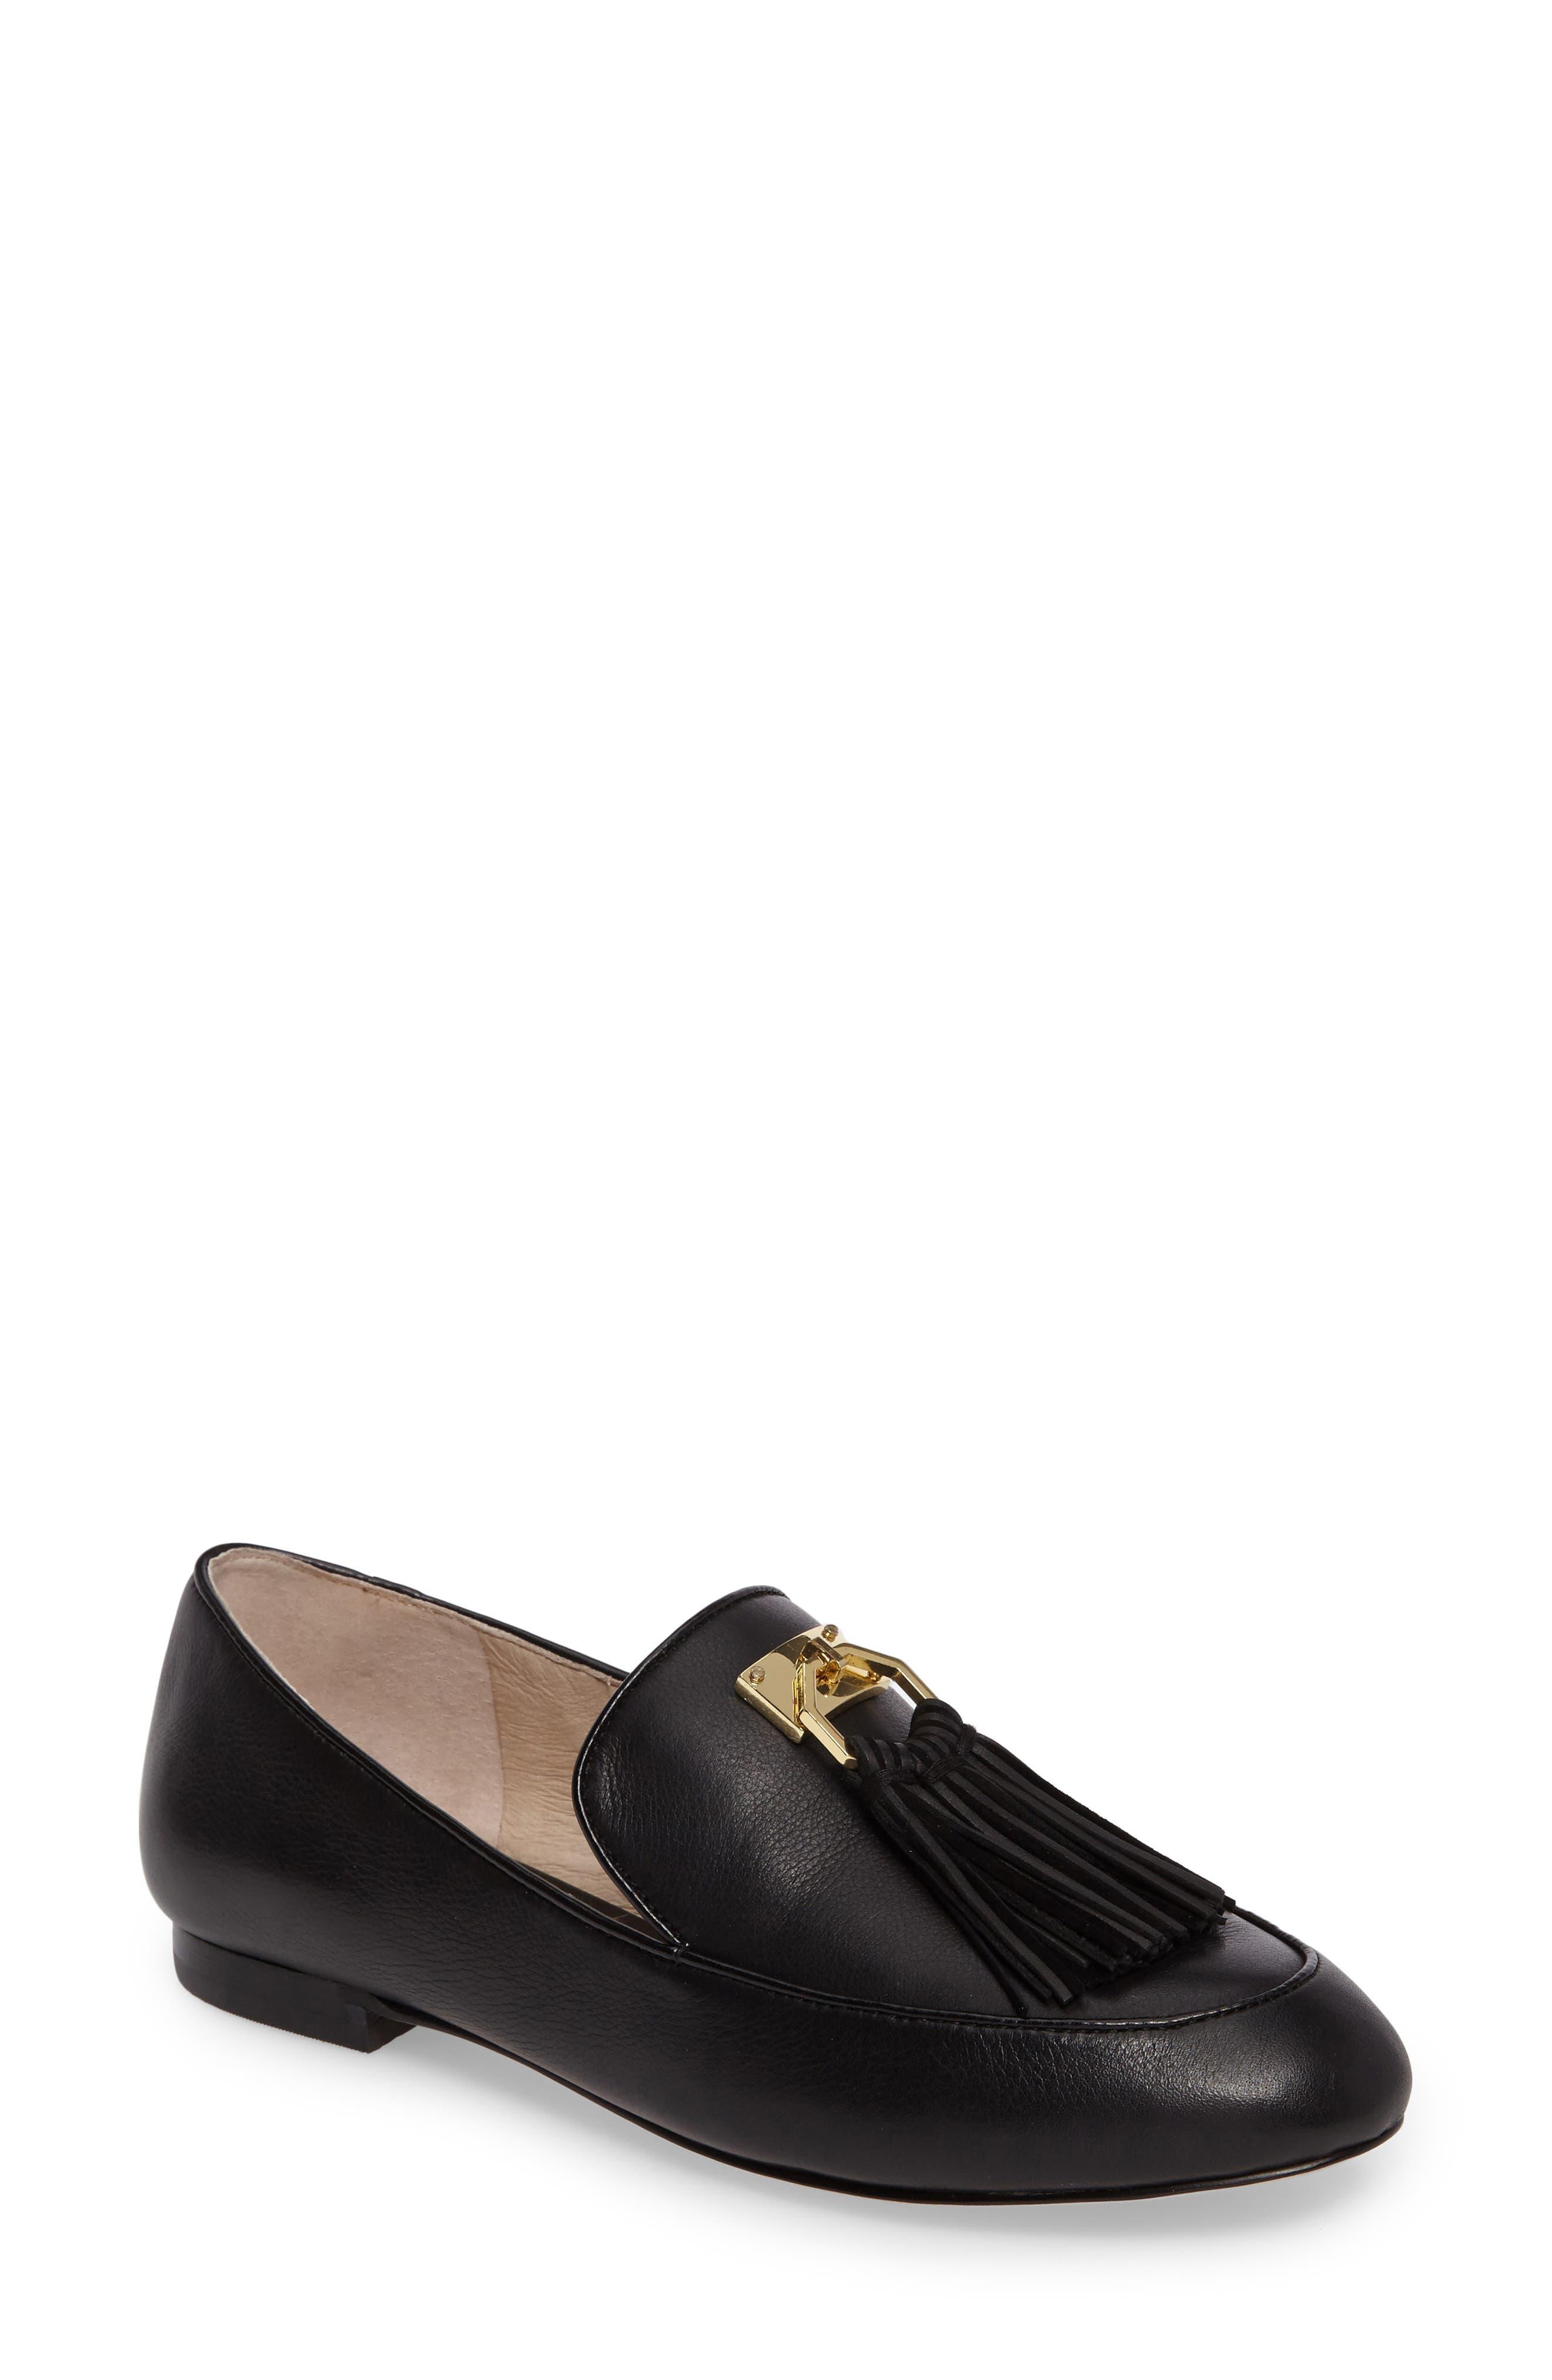 Faru Tassel Loafer,                             Main thumbnail 1, color,                             Black Leather